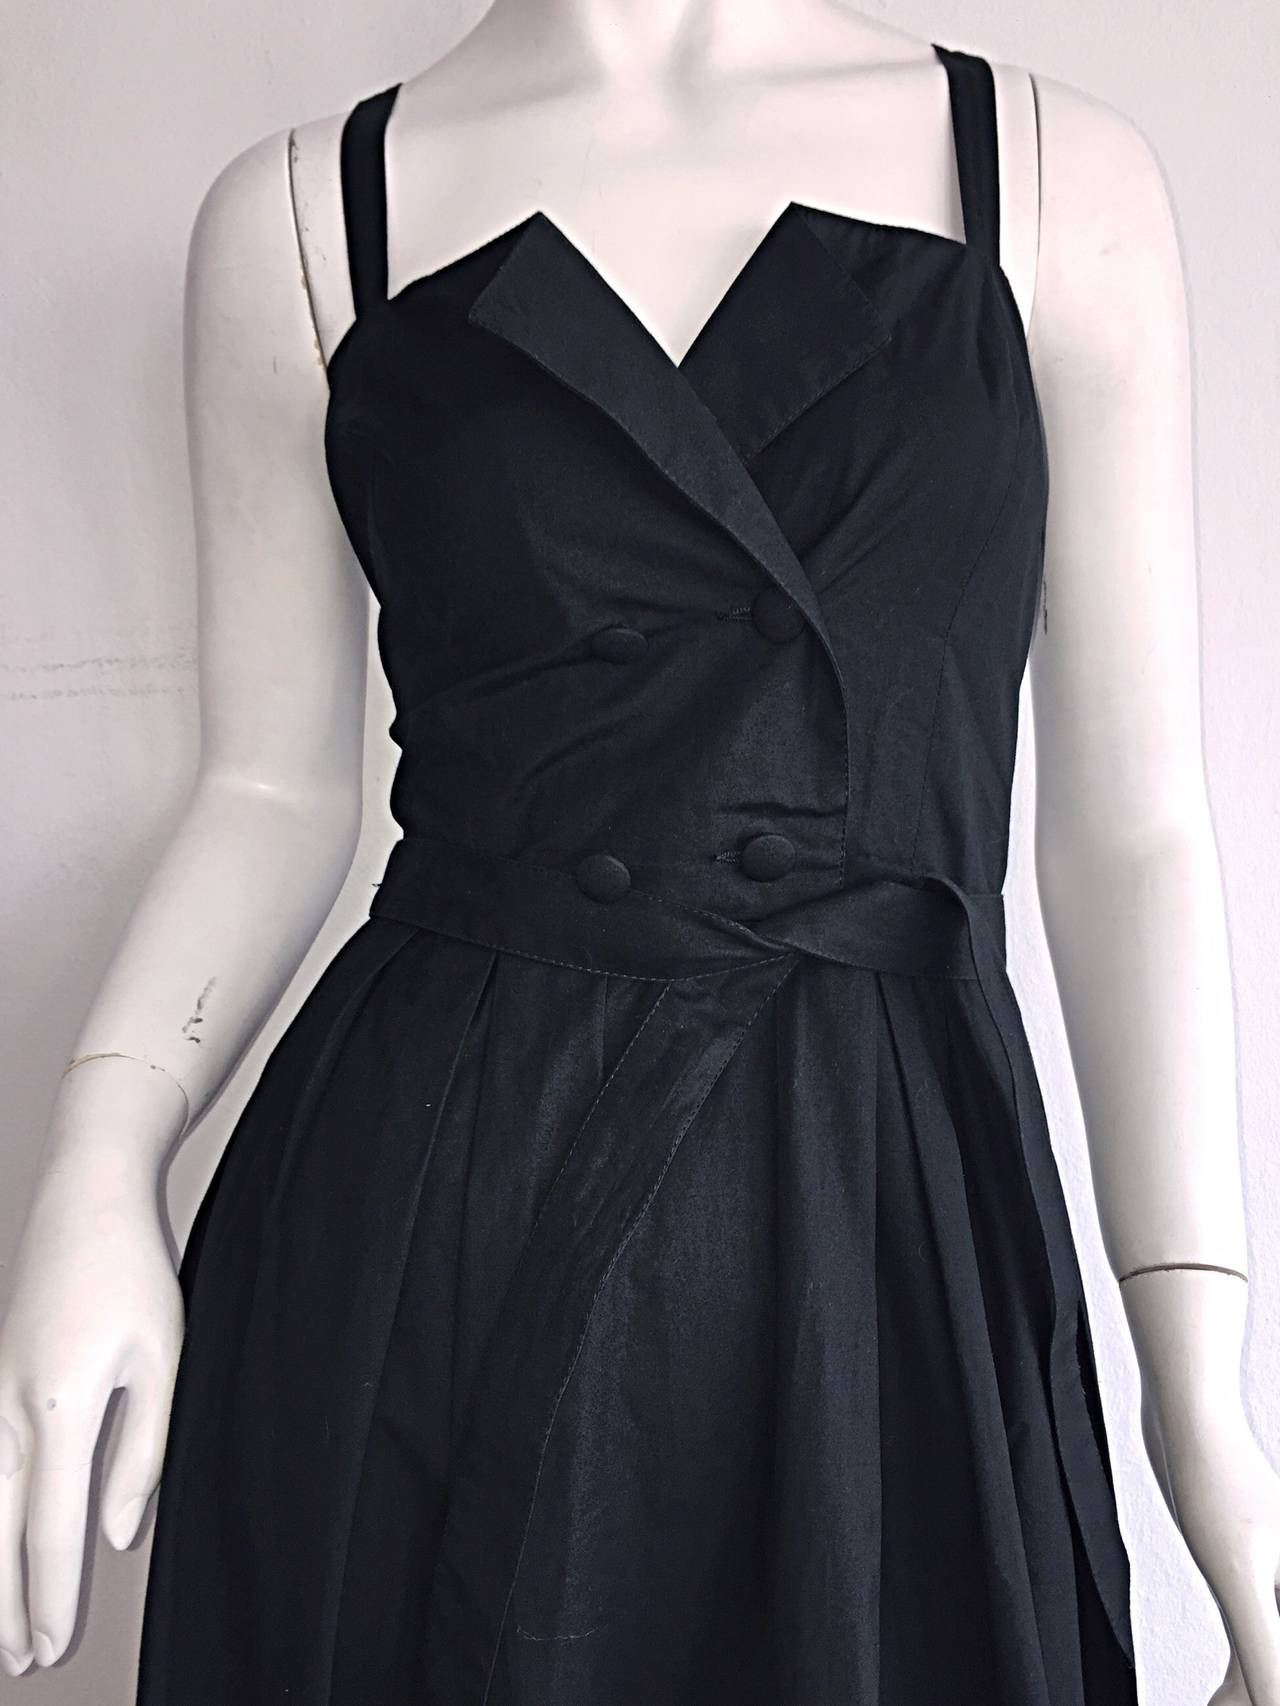 Beautiful Vintage Emmanuelle Khanh Black Cotton Tuxedo Sundress French Dress 2